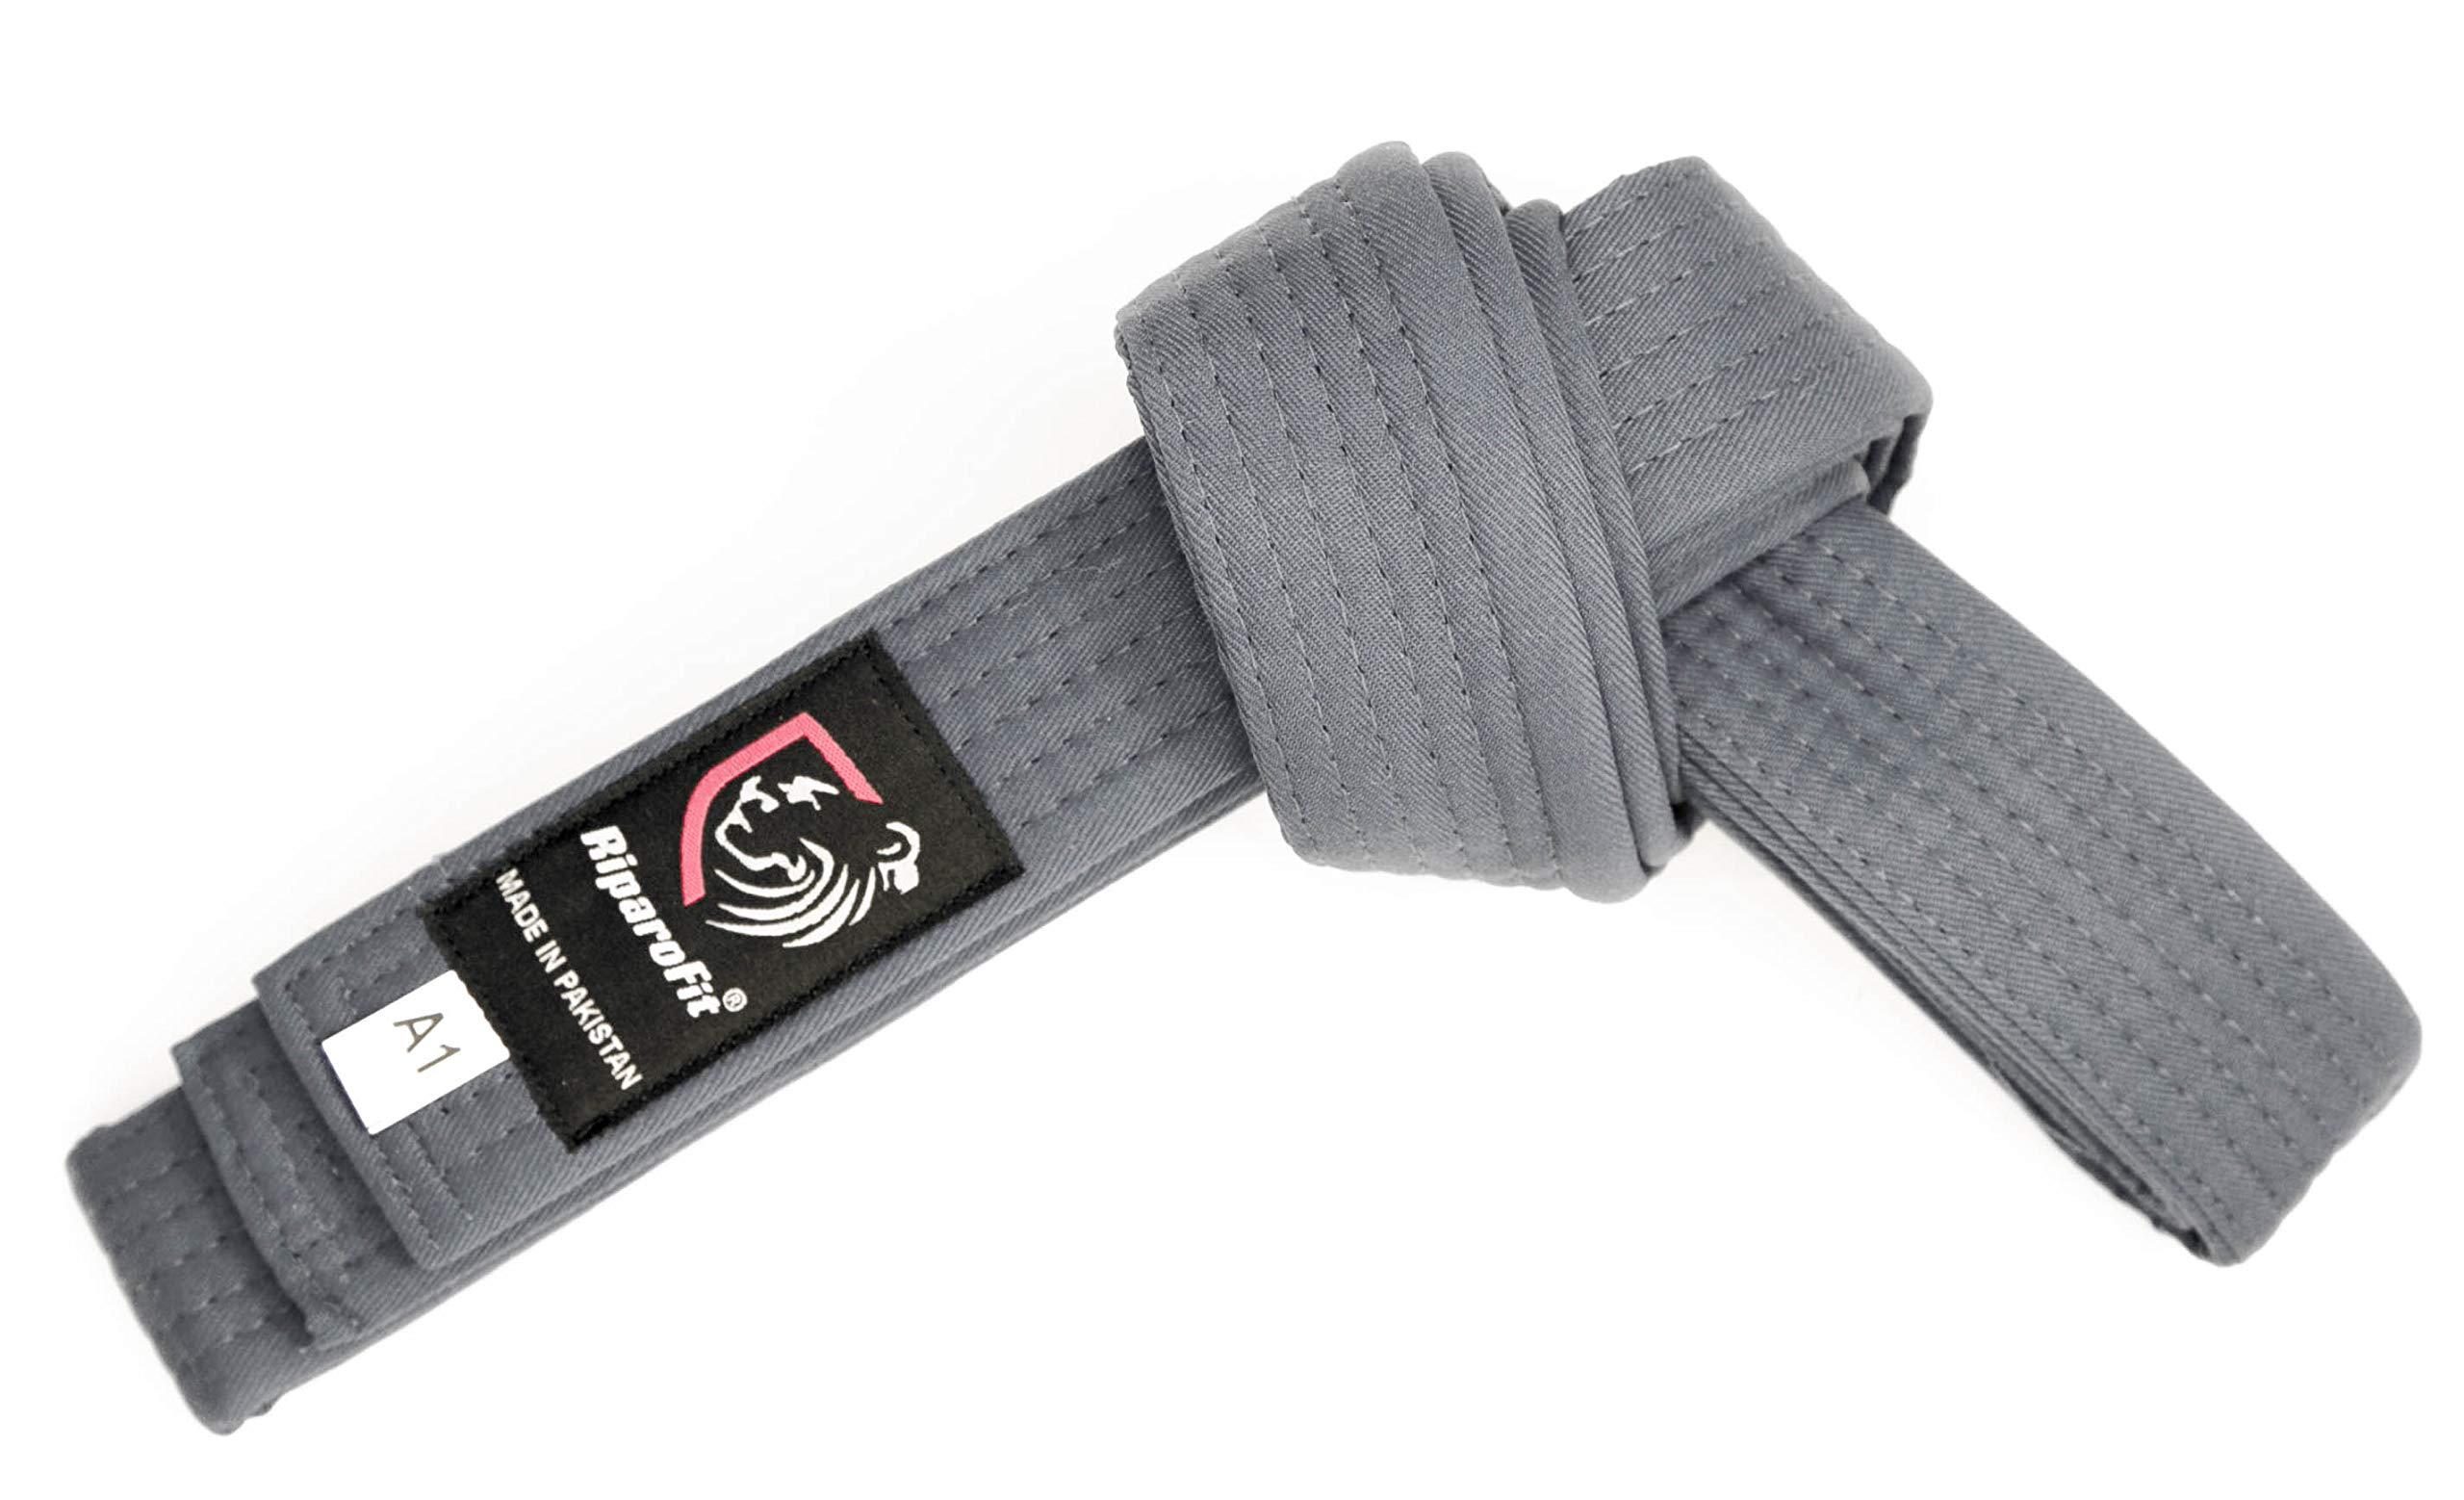 RiparoFit Brazilian Jiu Jitsu BJJ Pro Belts (Gray, K2) by RiparoFit